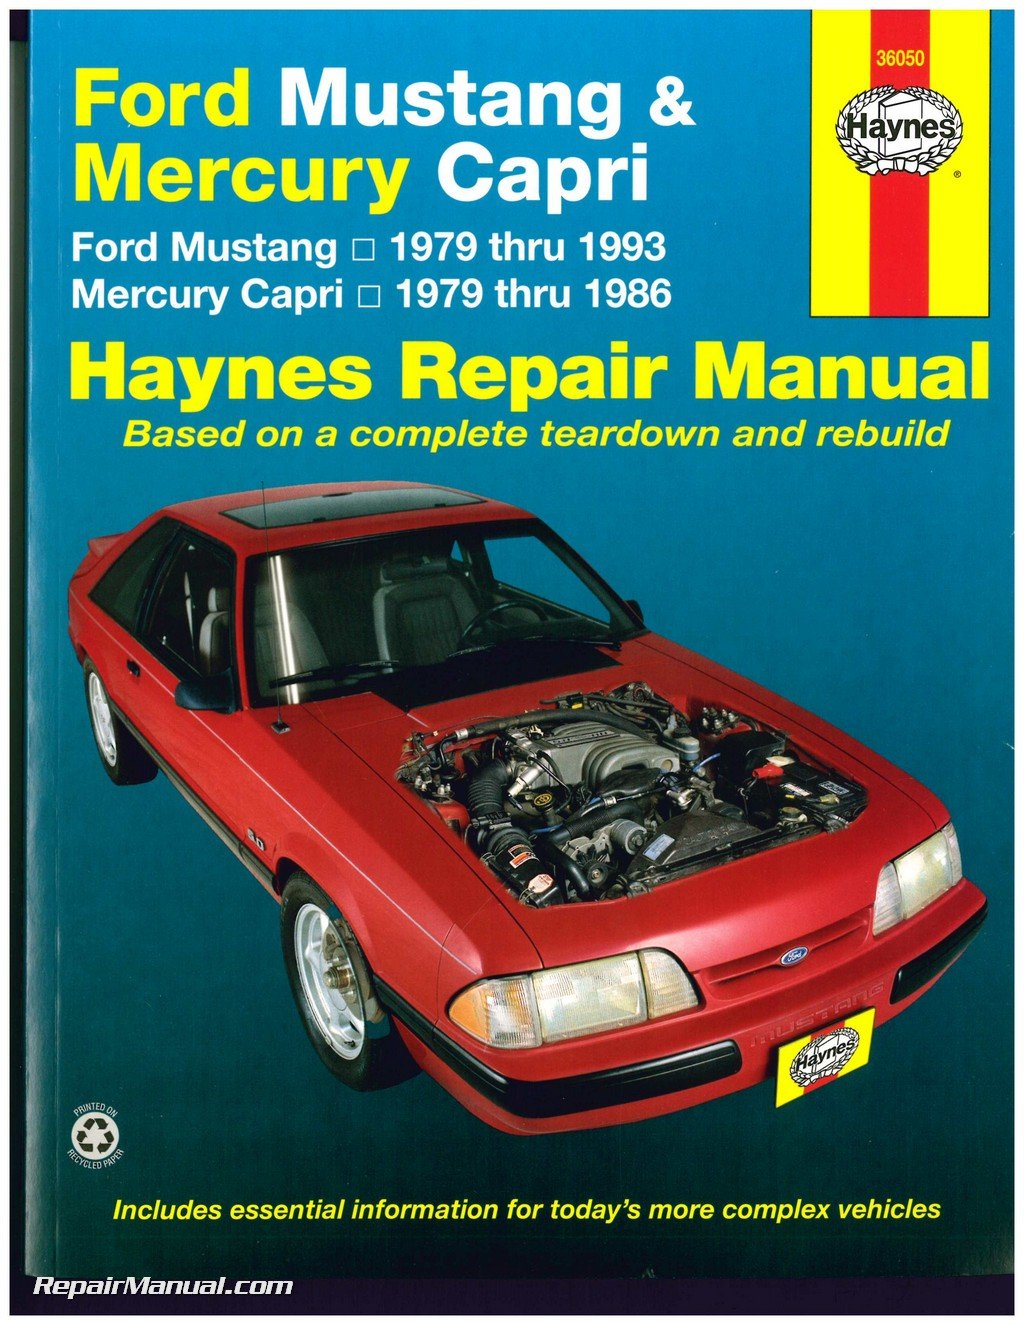 H36050 Haynes Ford Mustang 1979-1993 Mercury Capri 1979-1986 Auto Repair  Manual: Manufacturer: Amazon.com: Books